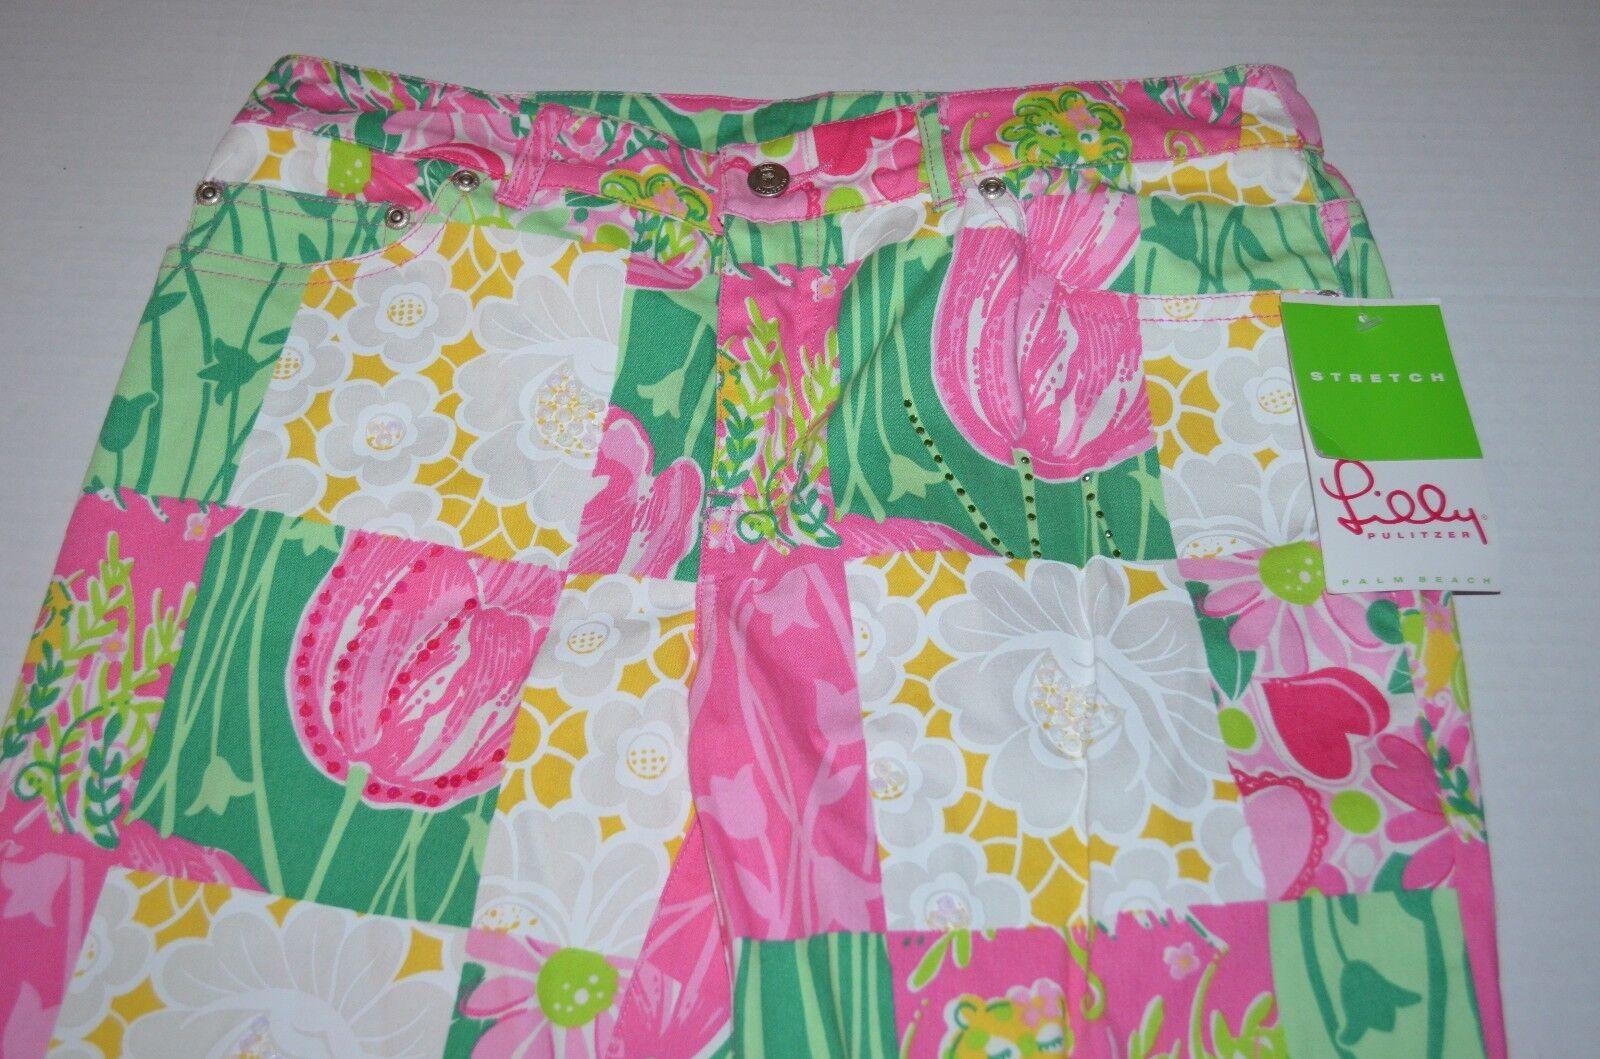 Lilly Pulitzer Pantalon 6 Stretch Serene Sparkle Jean Multi Derby patch  228 nouveau